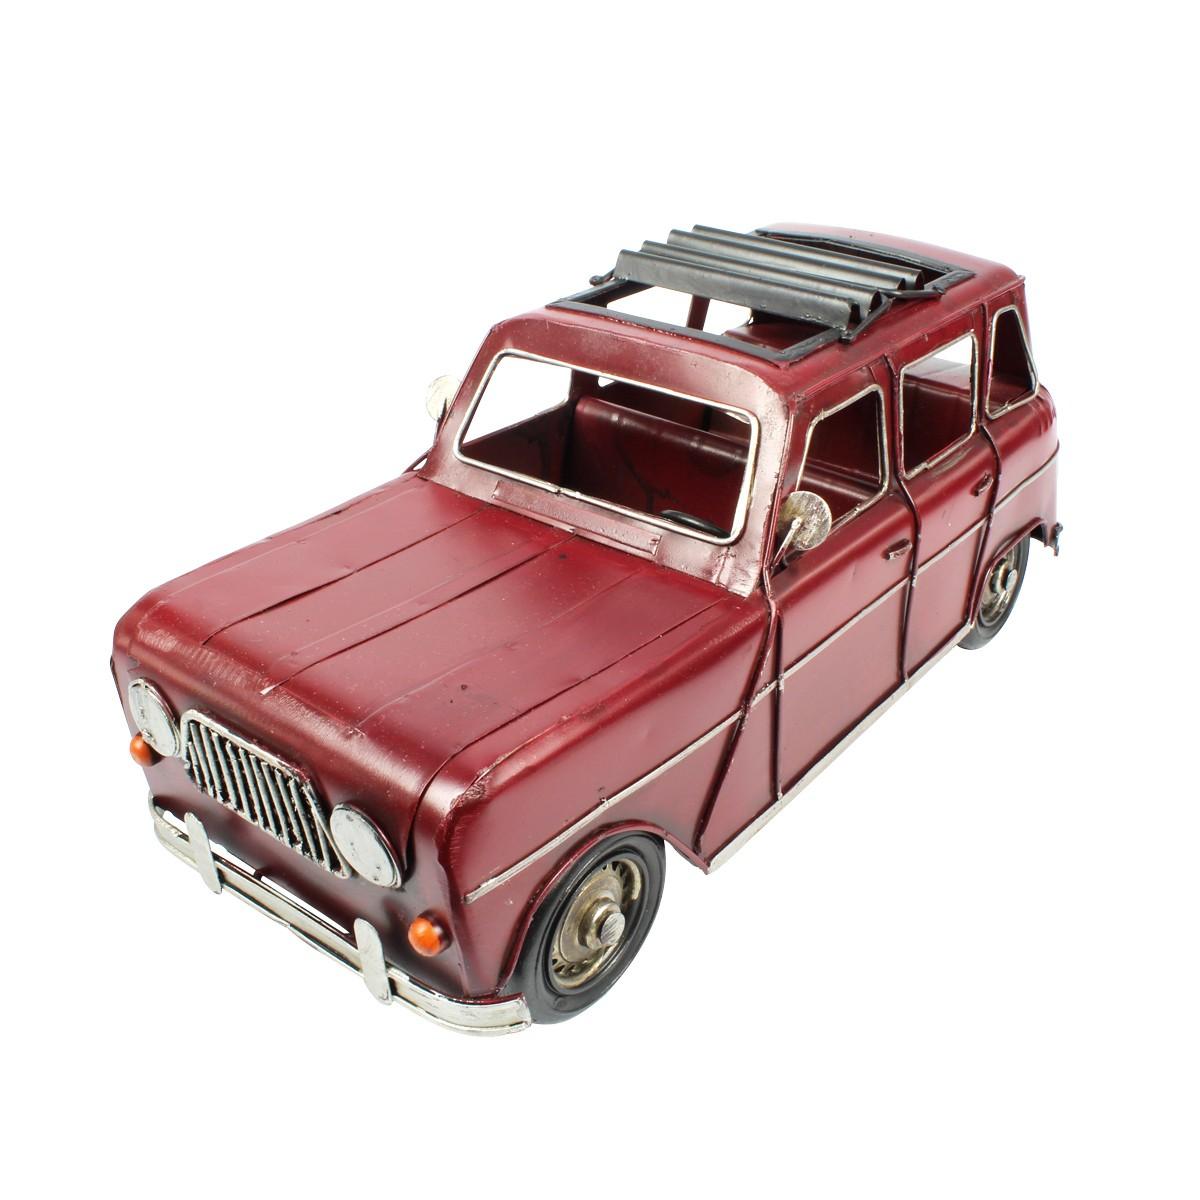 Miniatura de Metal Retrô Renault 4L Vinho